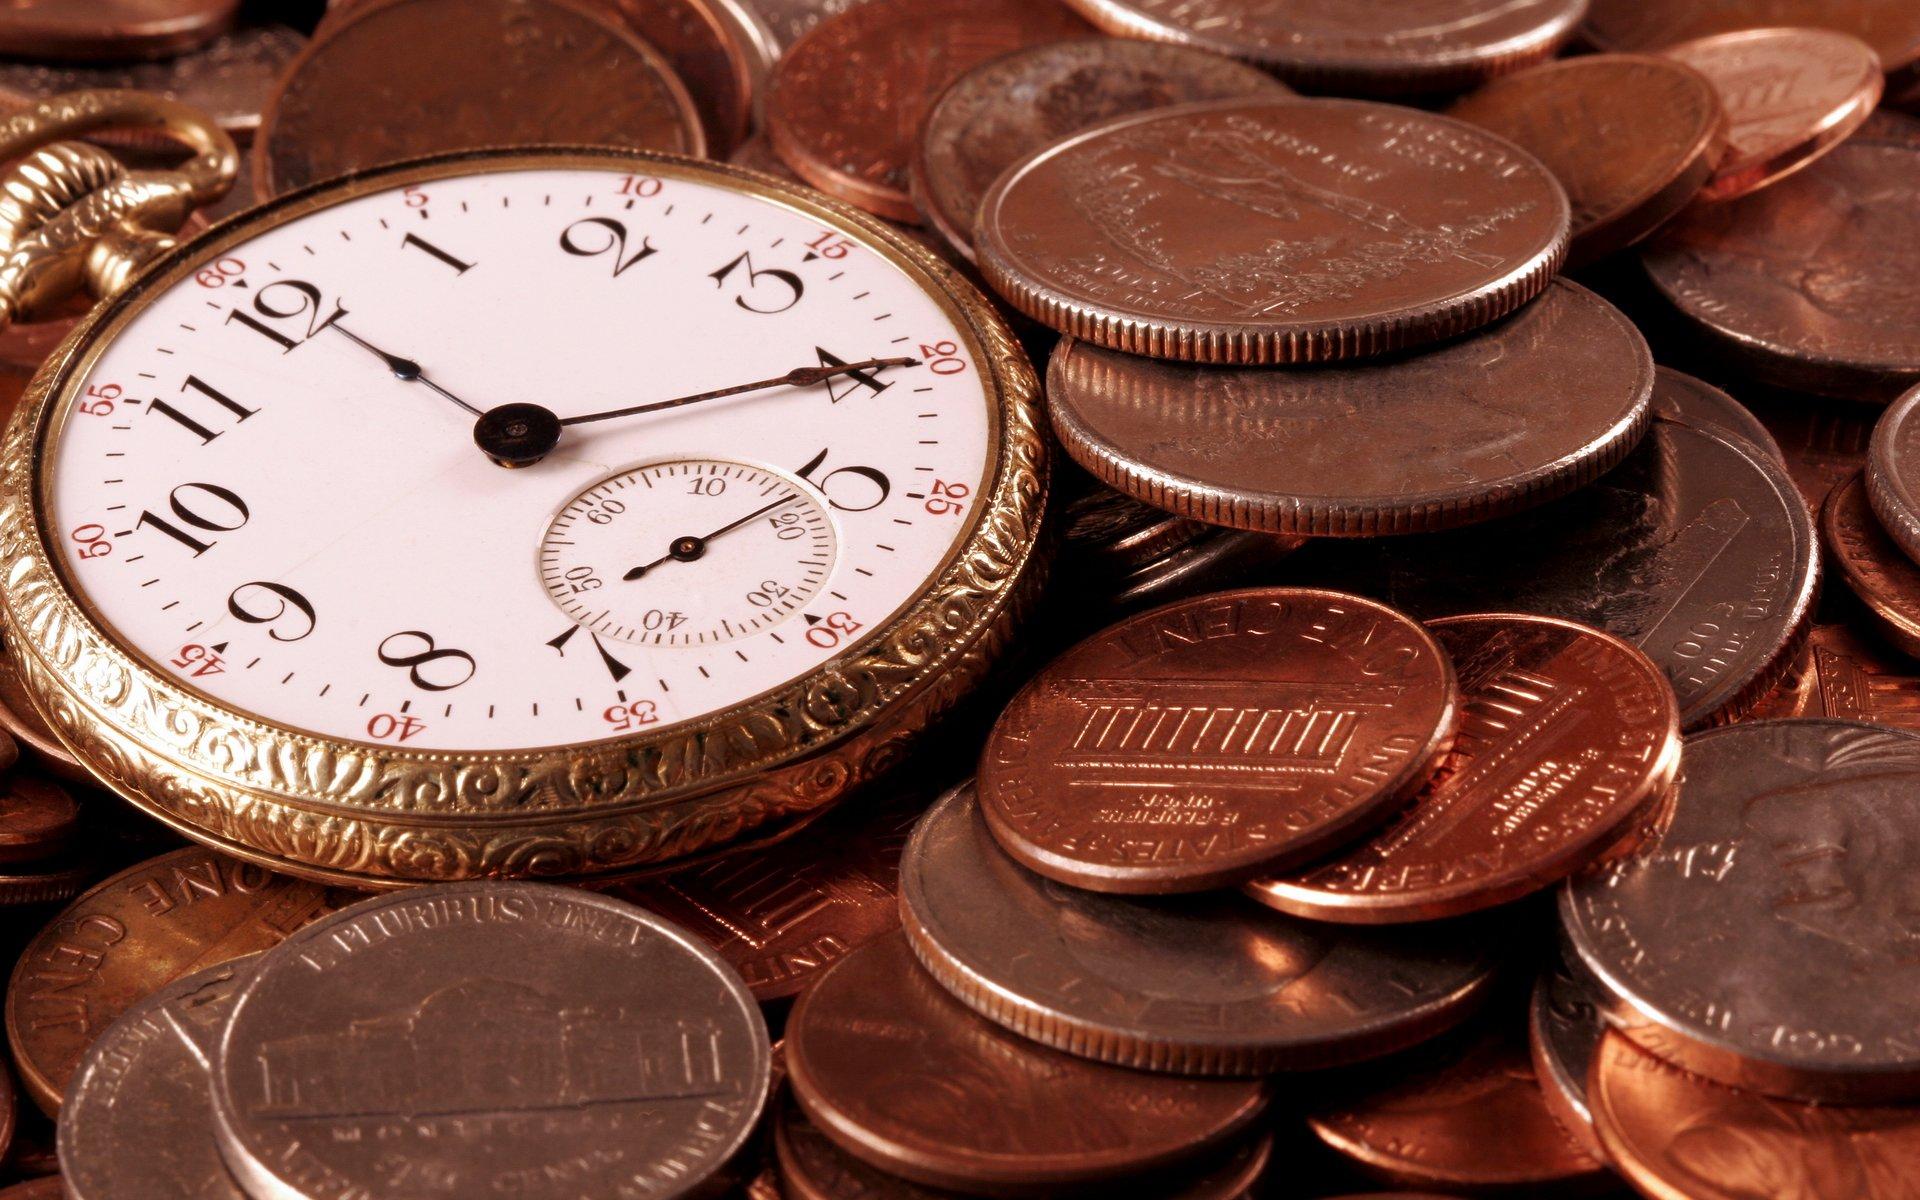 Snel geld samenzwering